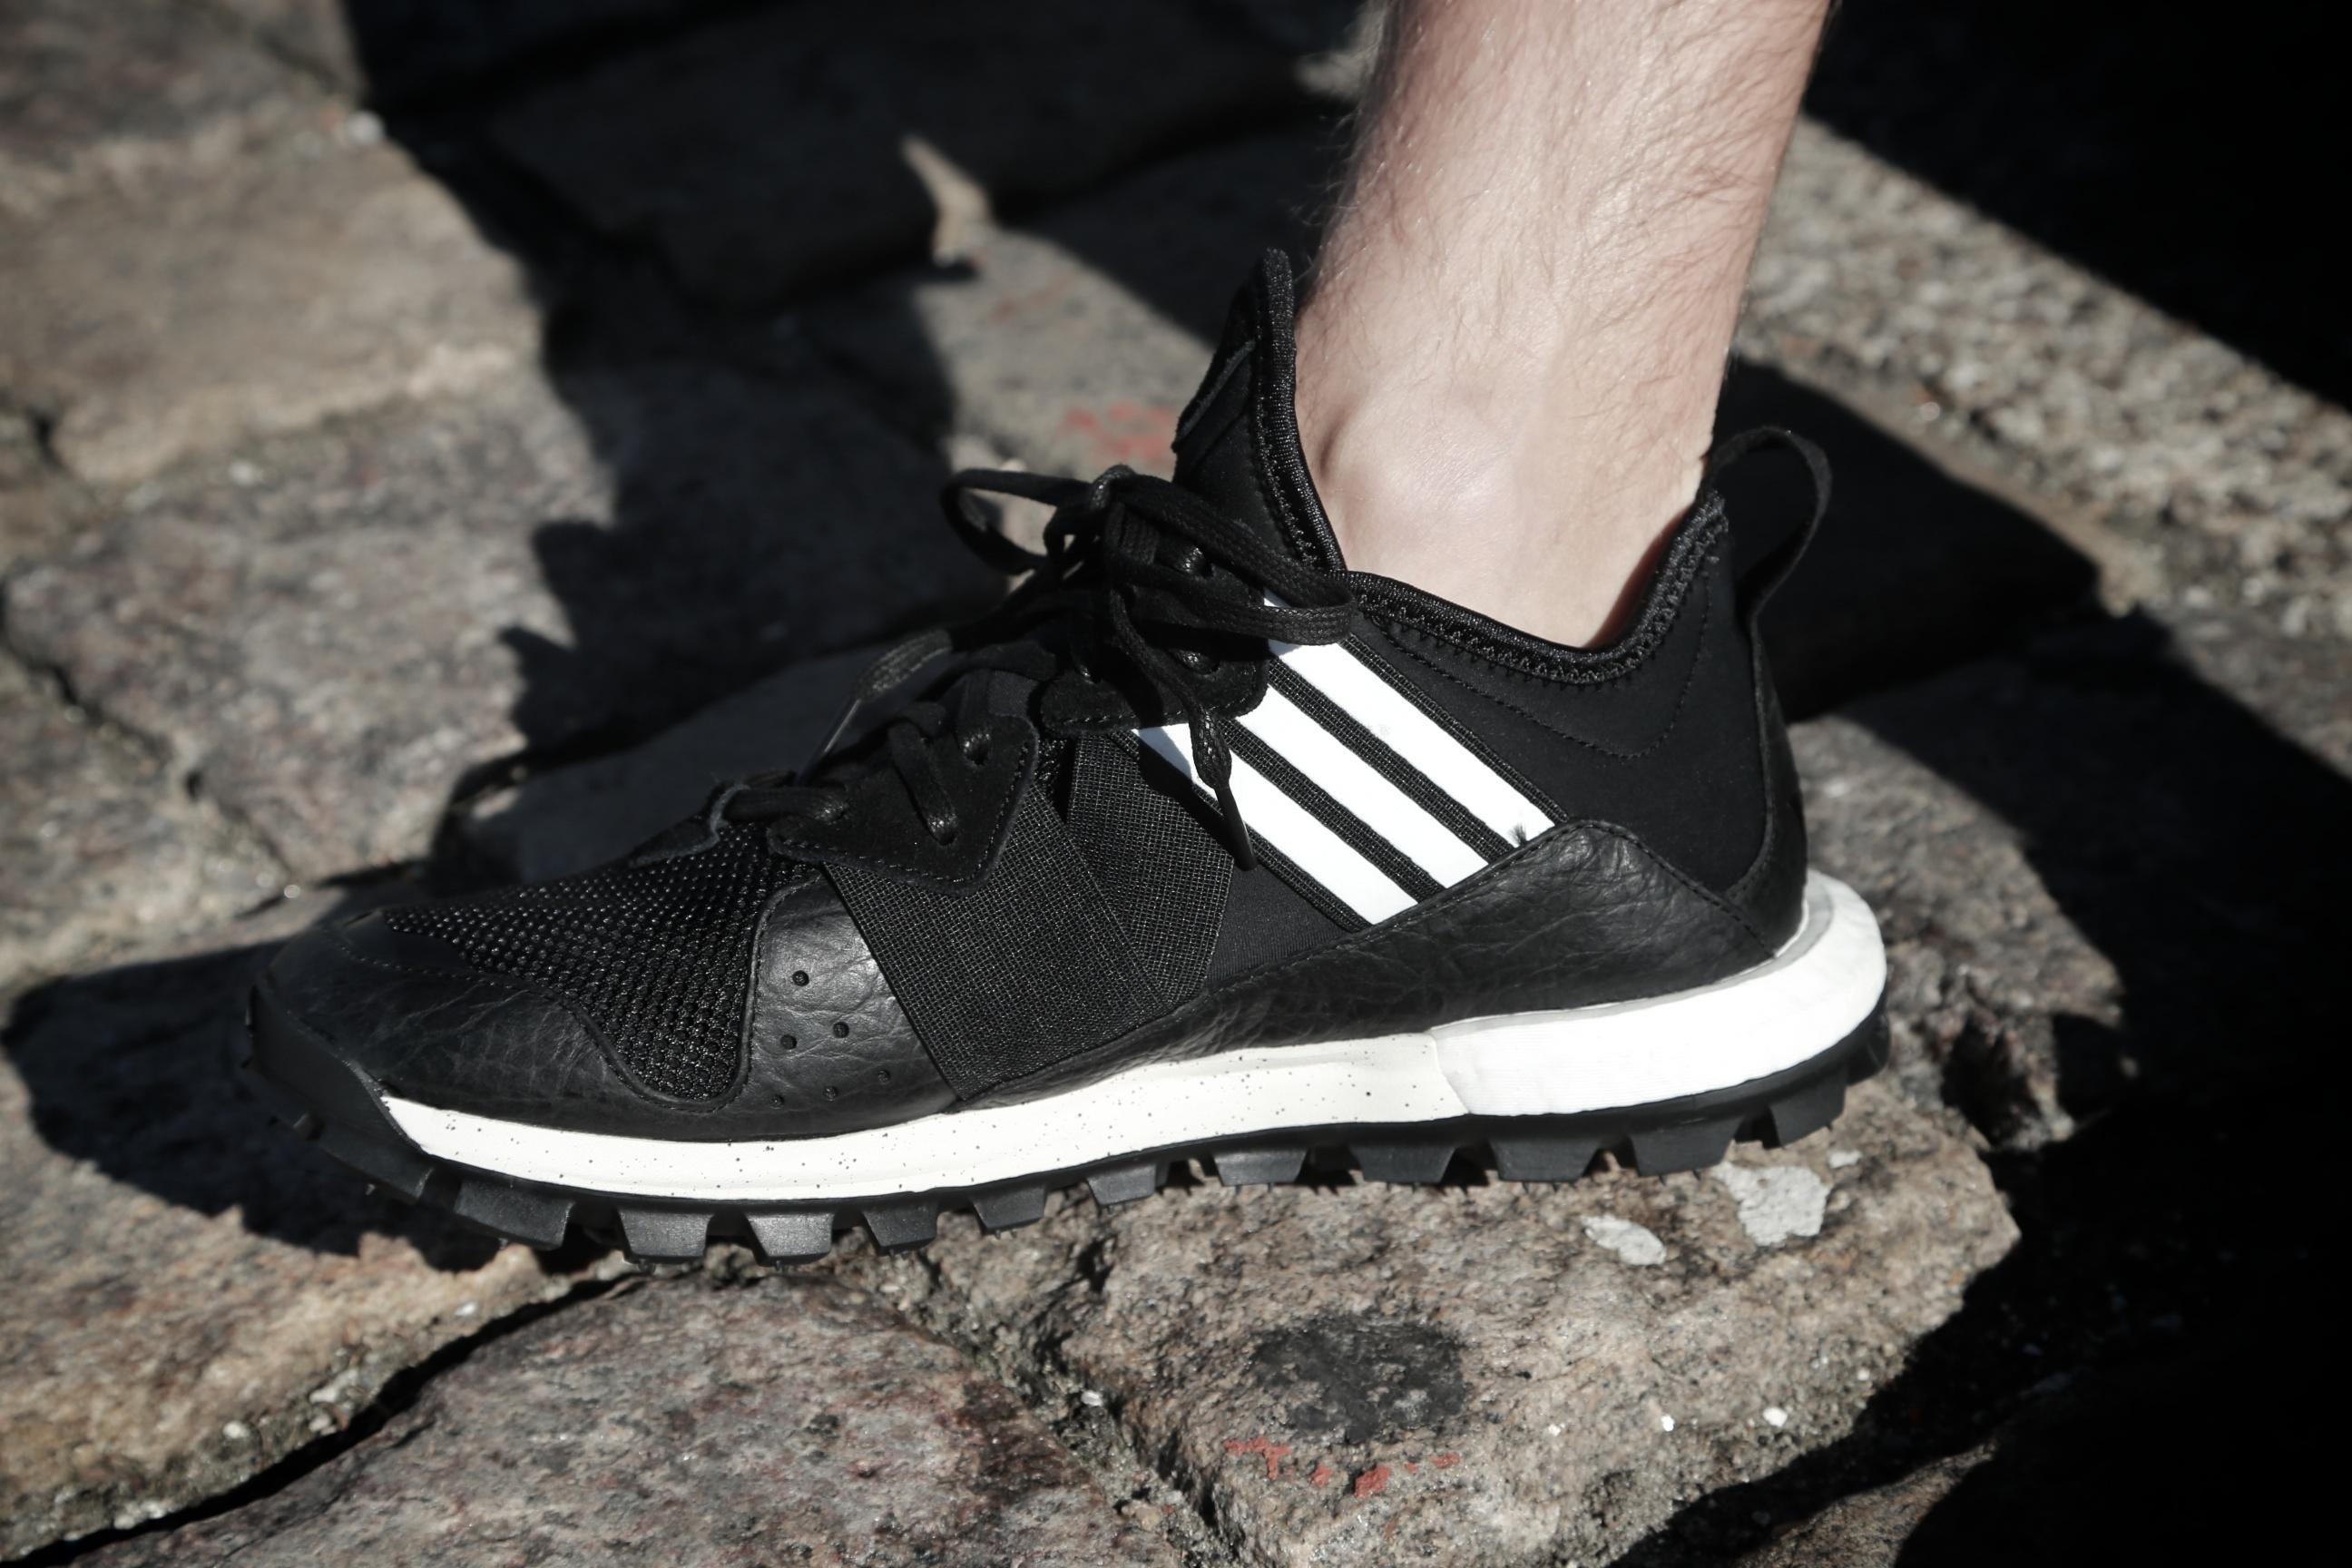 Adidas Y 3 Response Tr Boost Black Ftwr White Black